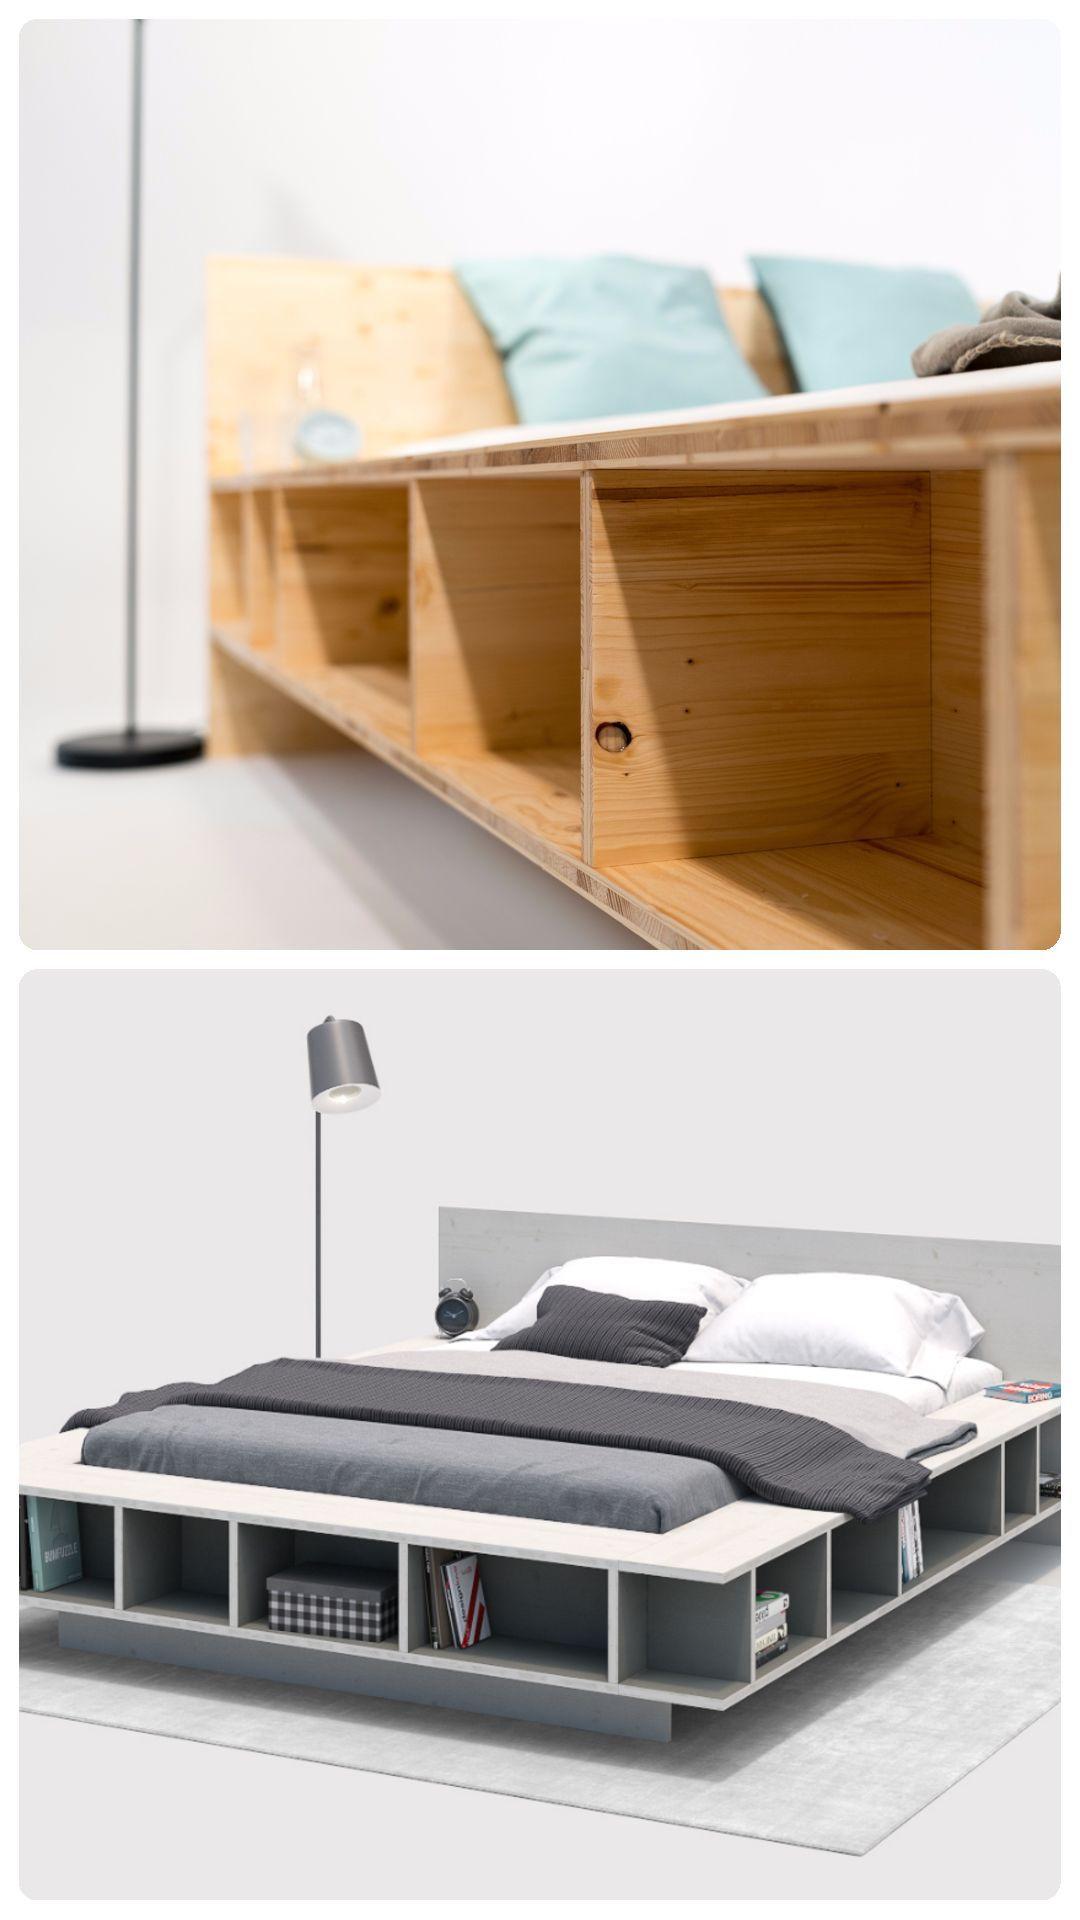 Bett Wilhelm Selbst Bauen Alle Mobel Obi Selbstbaumobel Bett Bed Bedroom In 2020 Bett Bauen Bett Mobel Bett